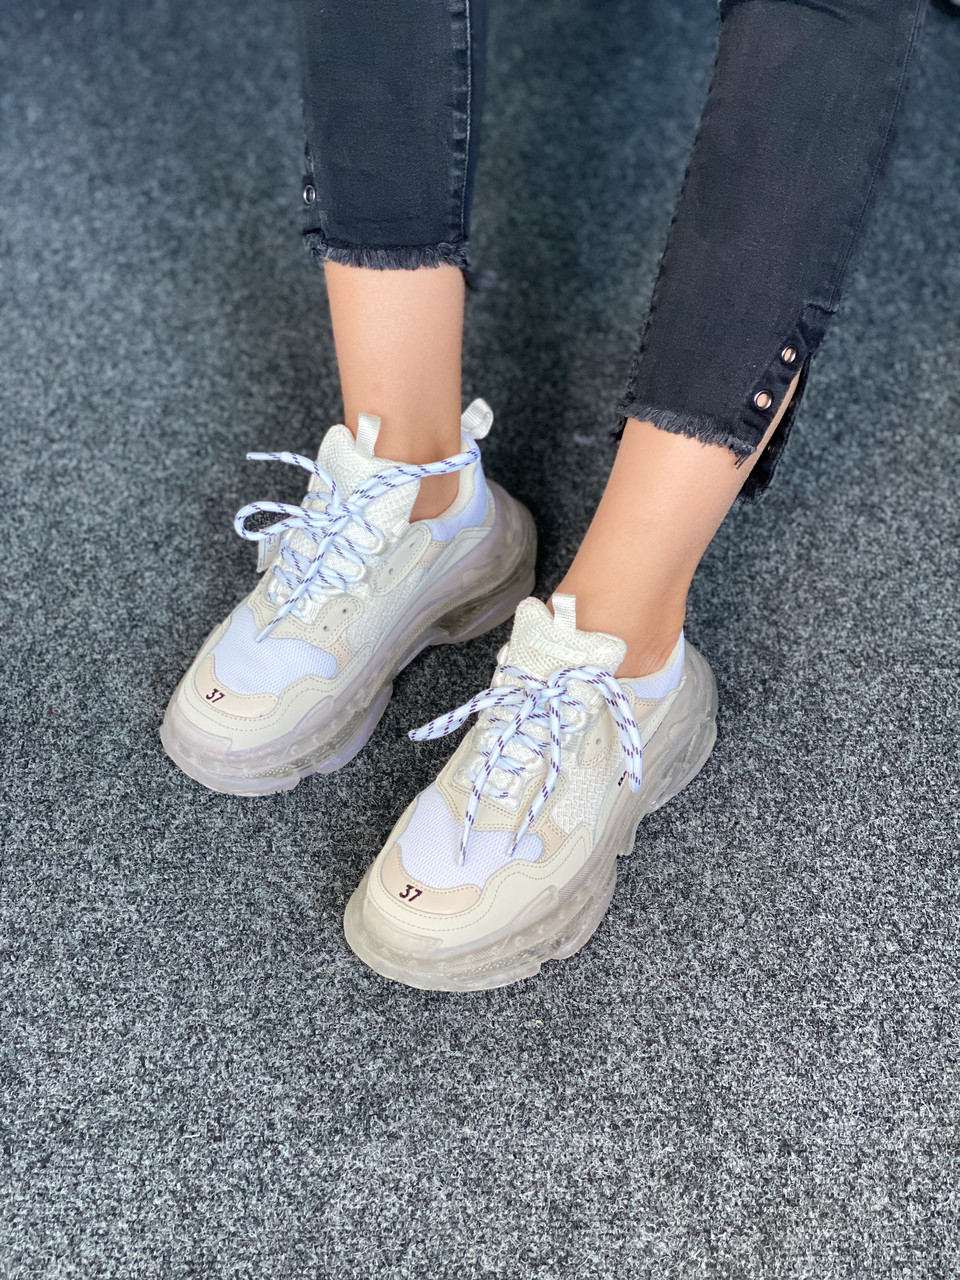 Білі кросівки Balenciaga Triple S Clear Sole White